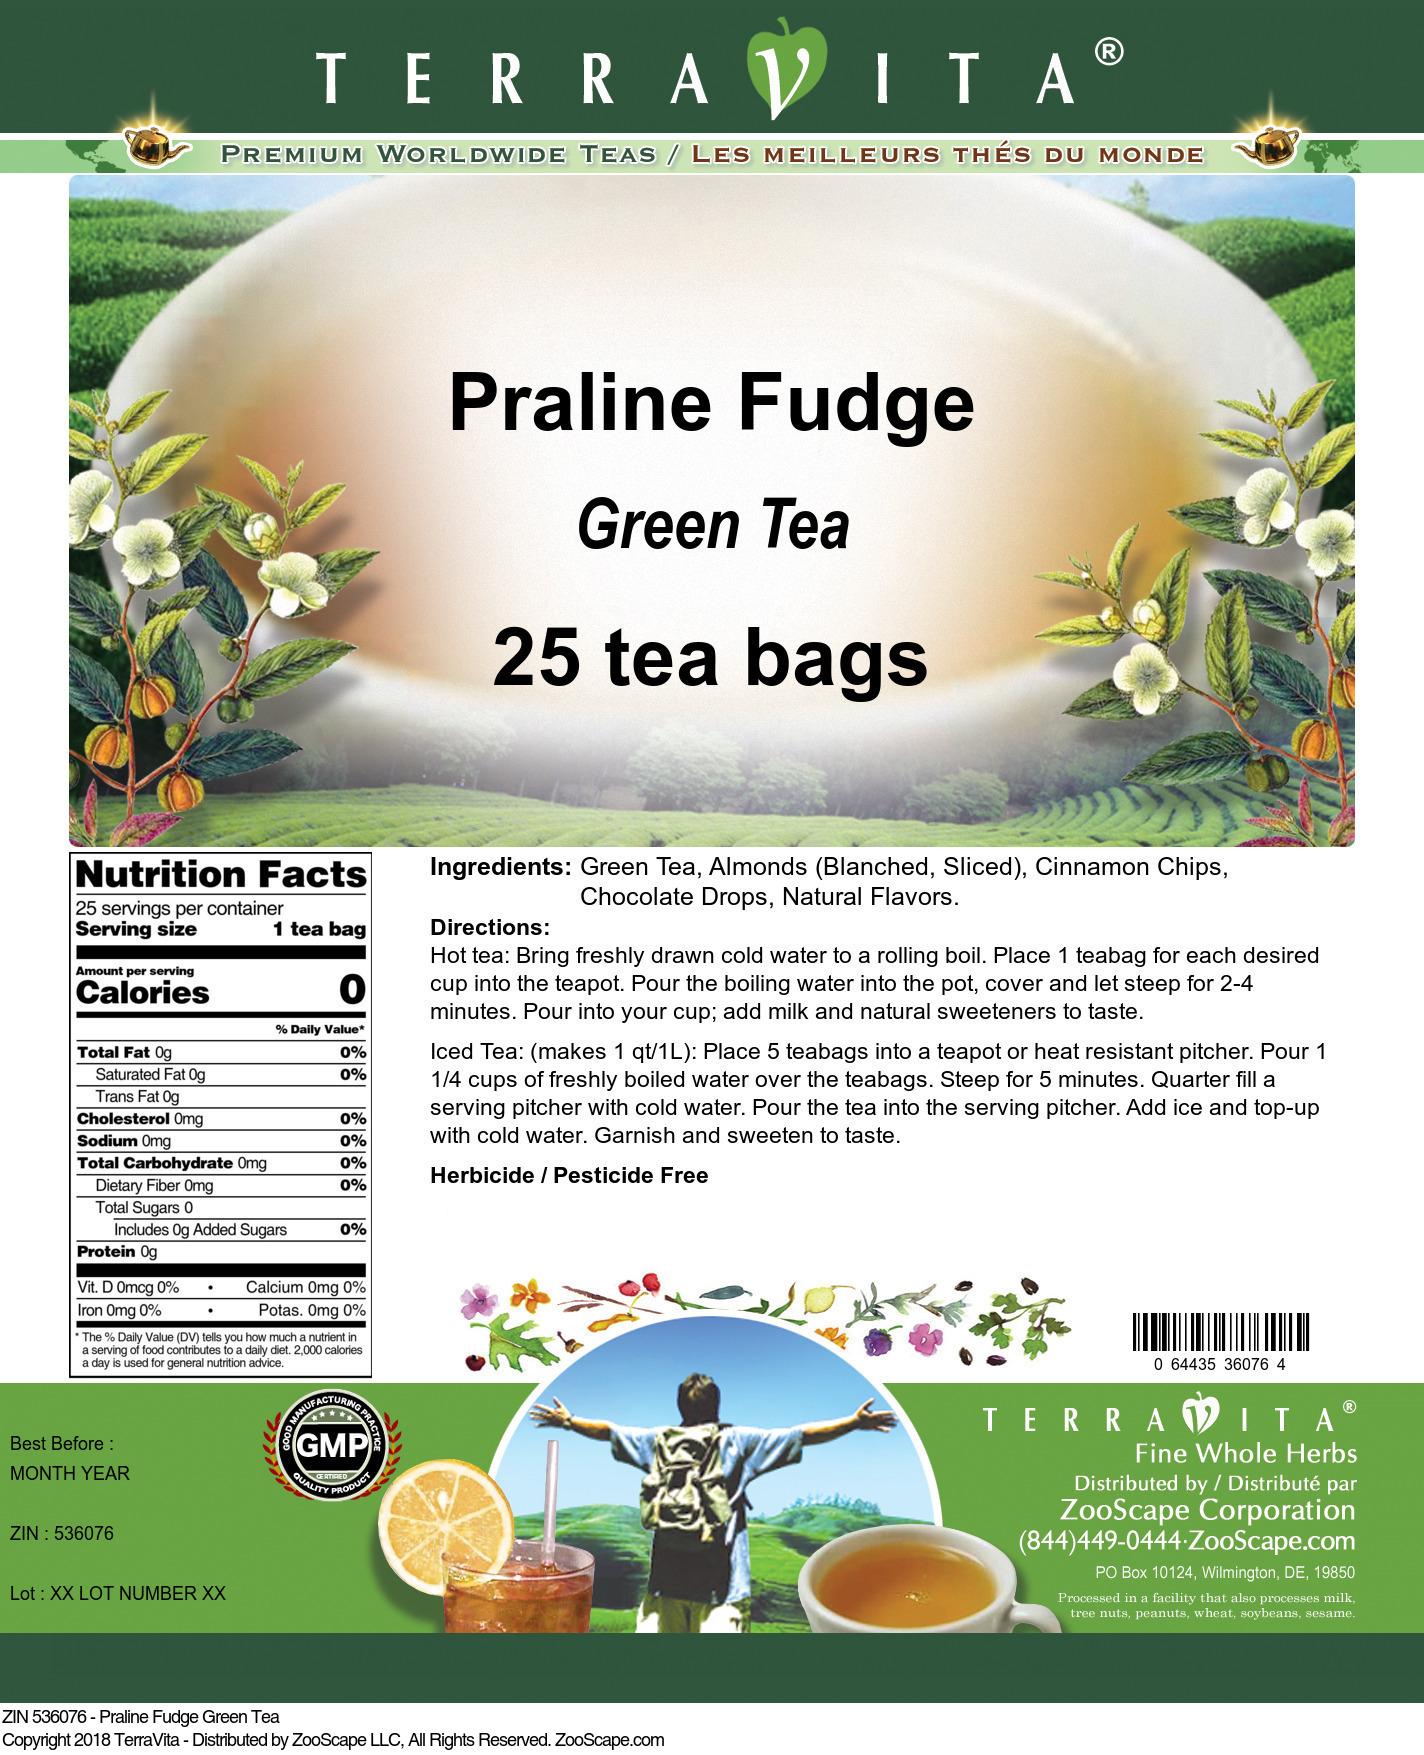 Praline Fudge Green Tea